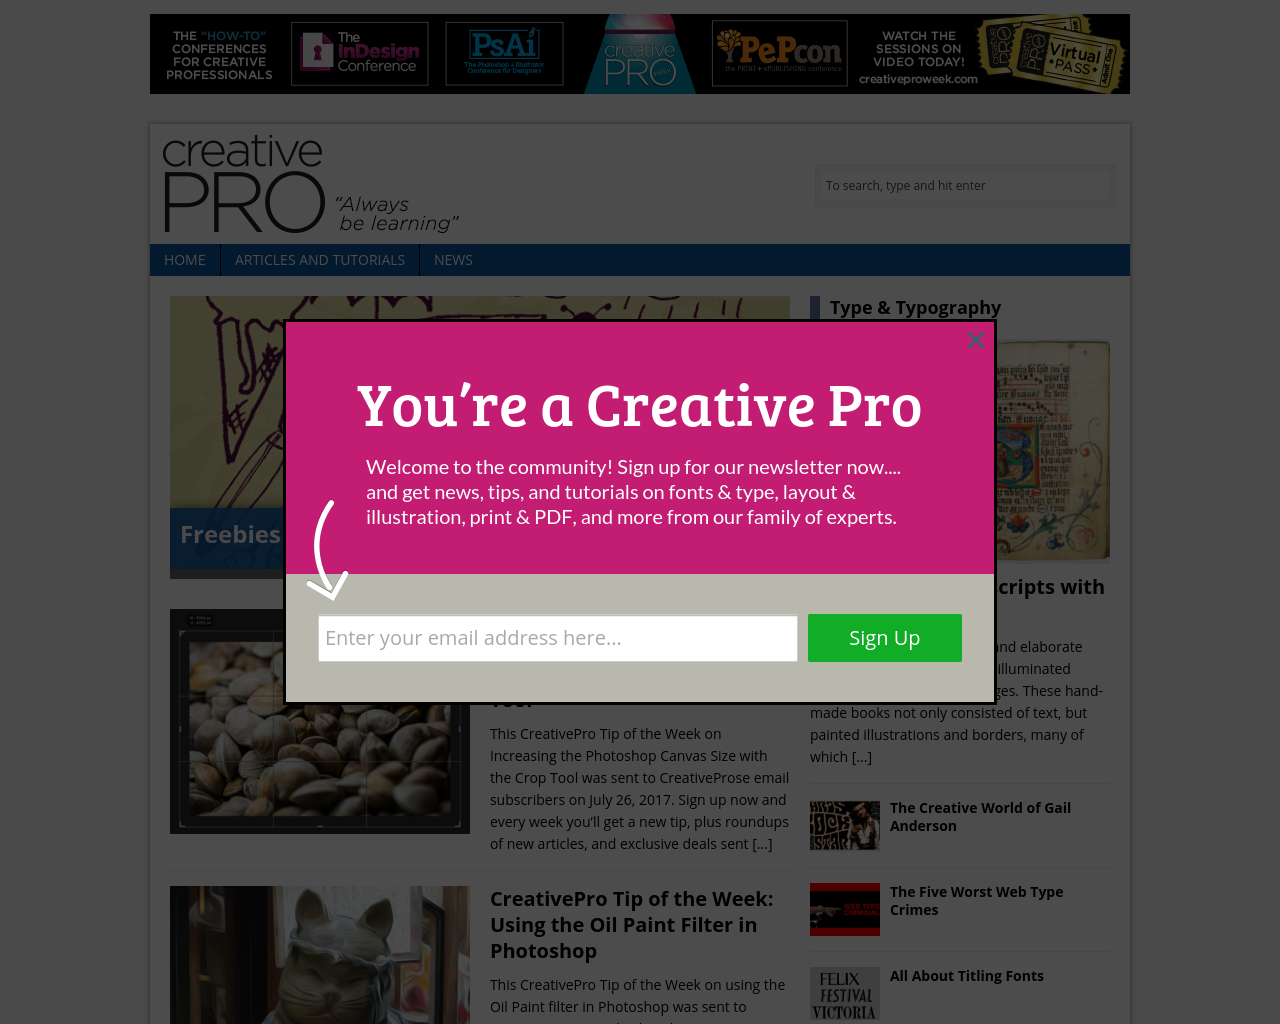 Creativepro.com-Advertising-Reviews-Pricing